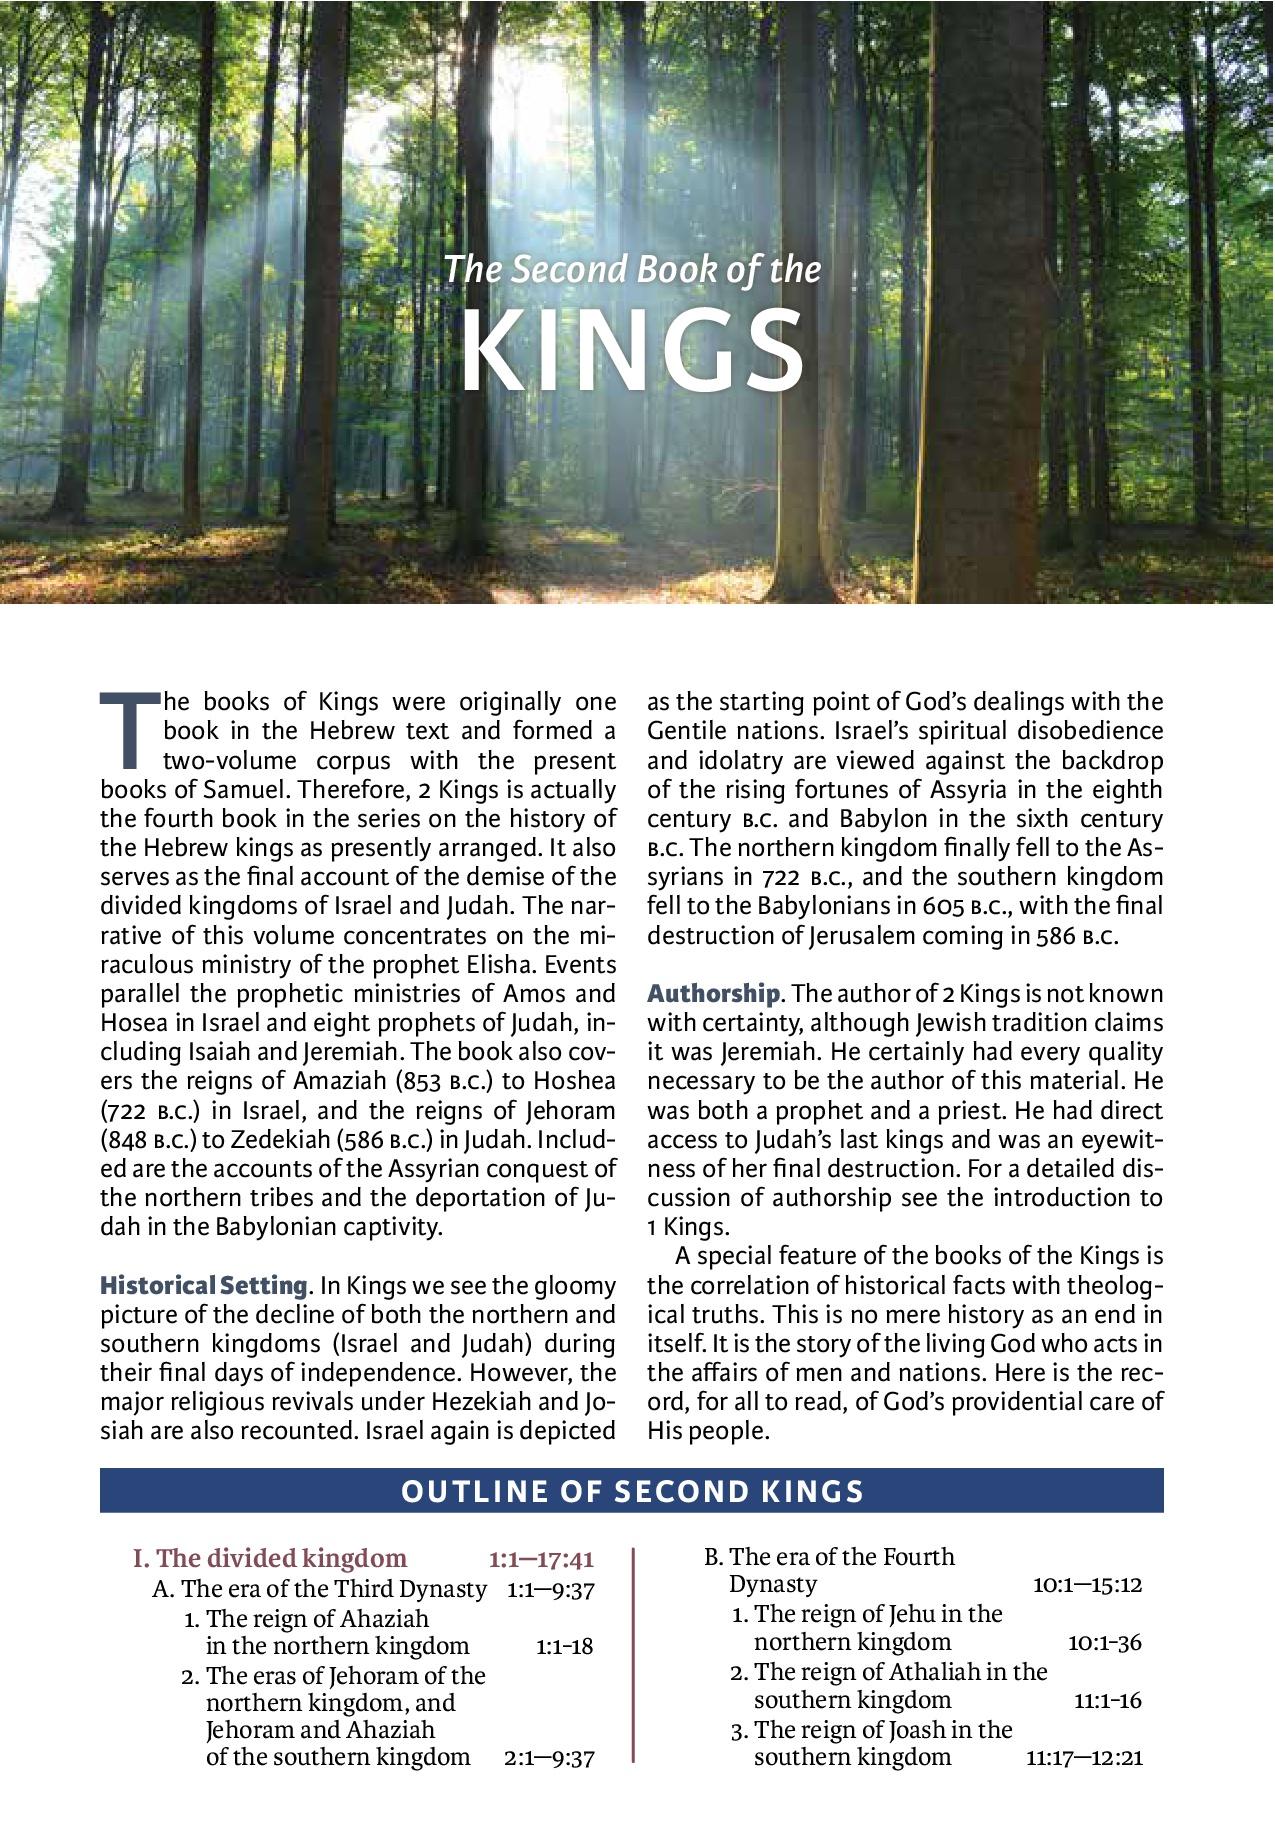 KJV Biblical Study